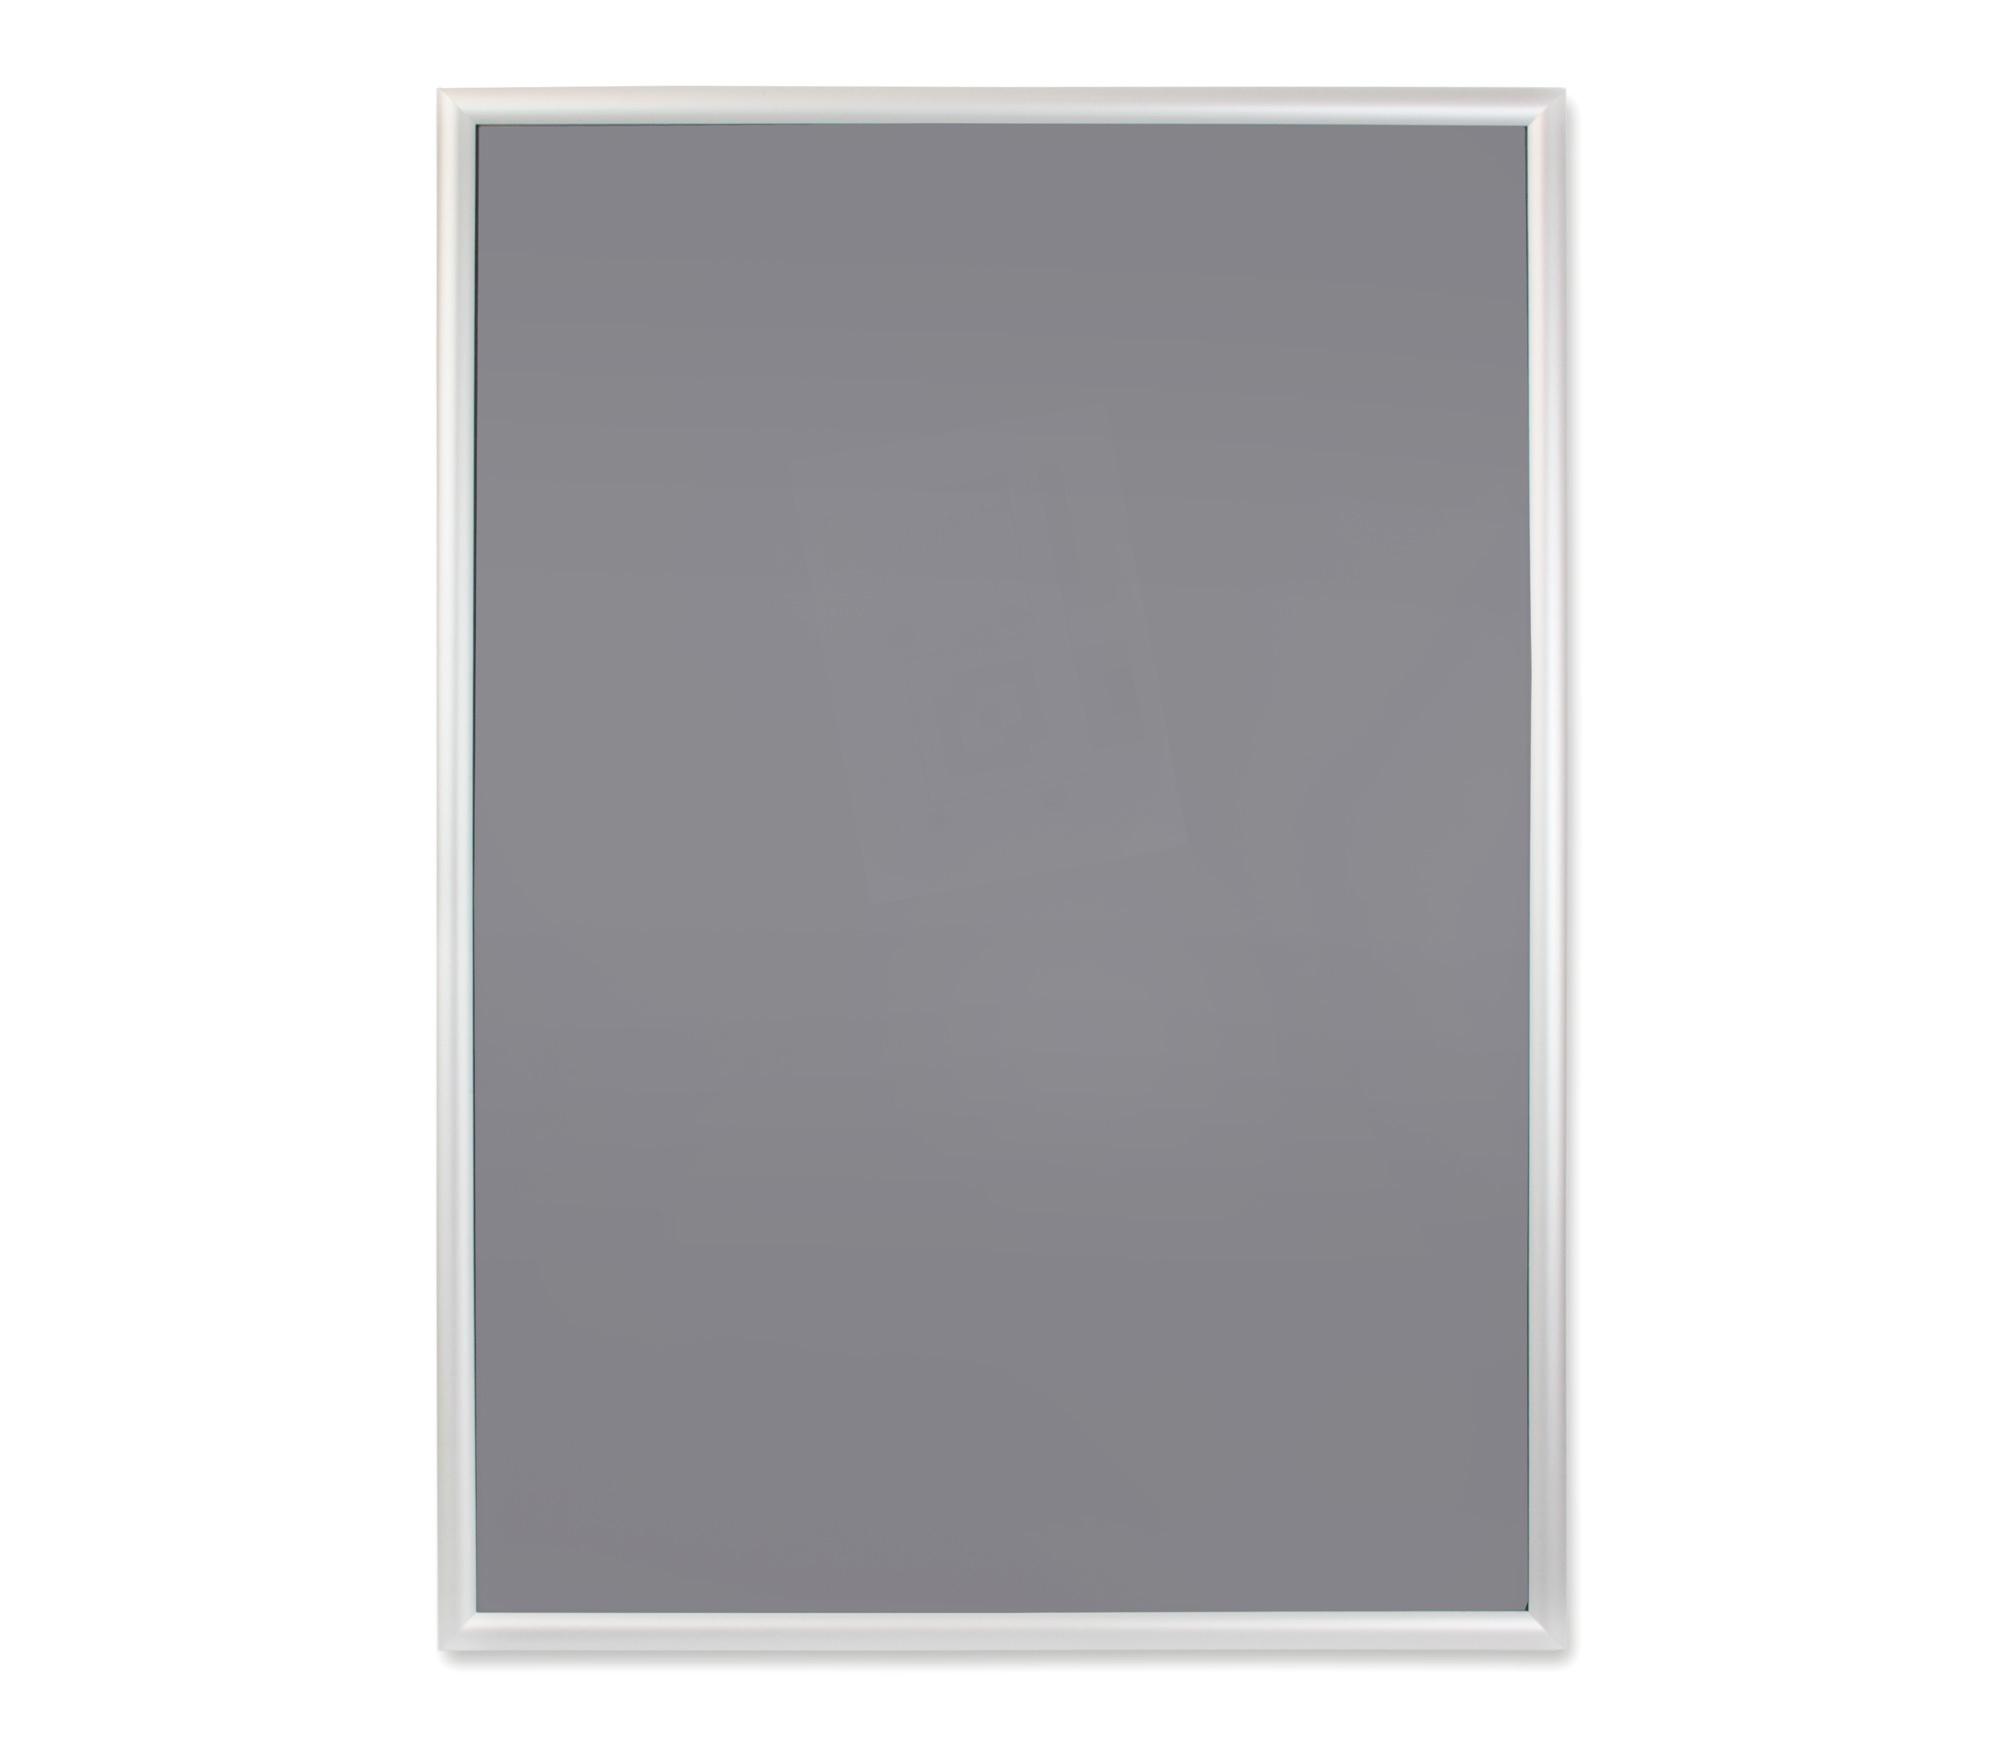 Ramka OWZ B1 plakatowa zatrzaskowa aluminiowa